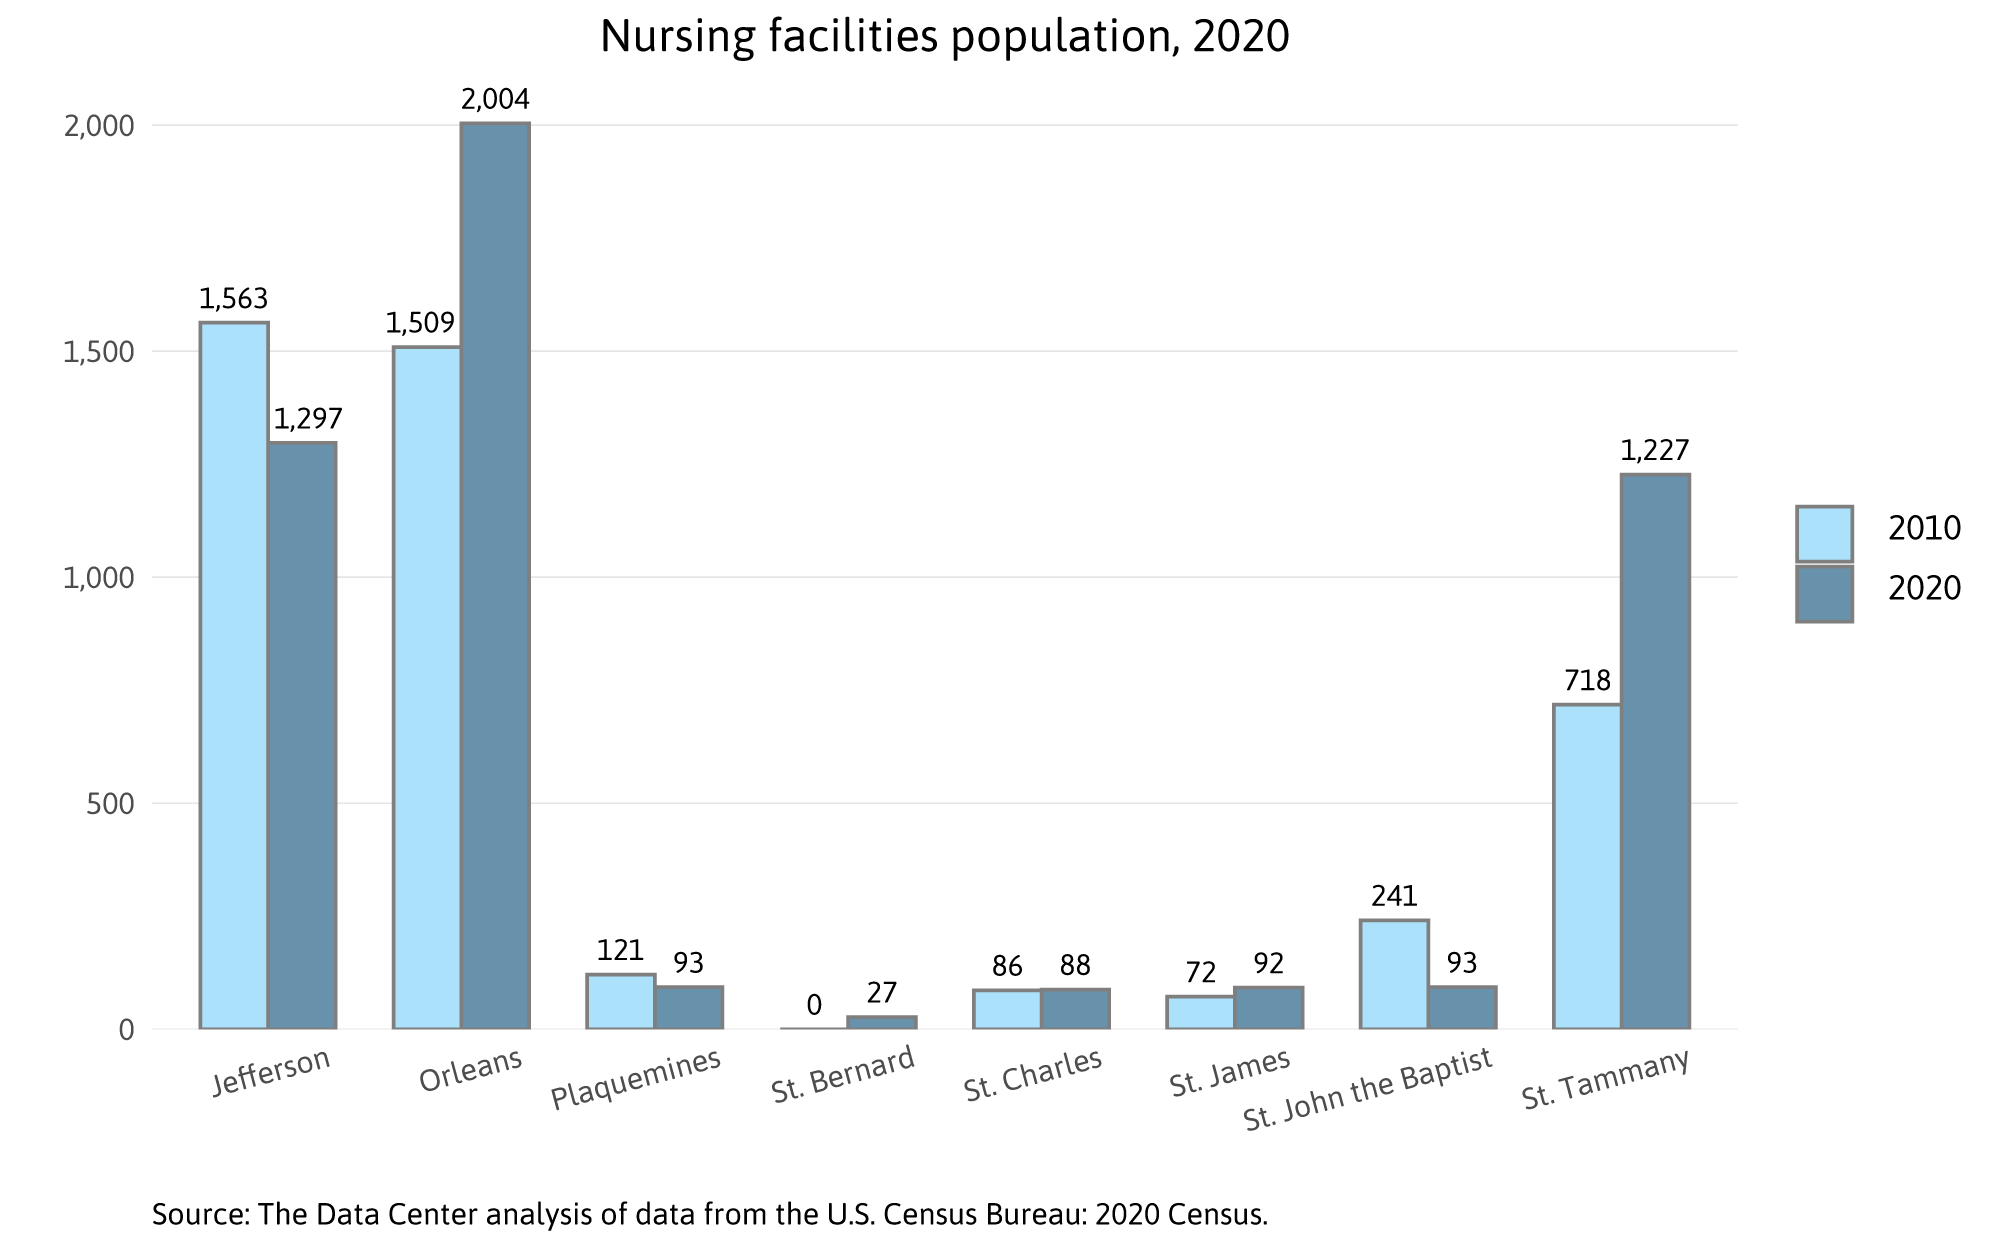 Nursing facilities